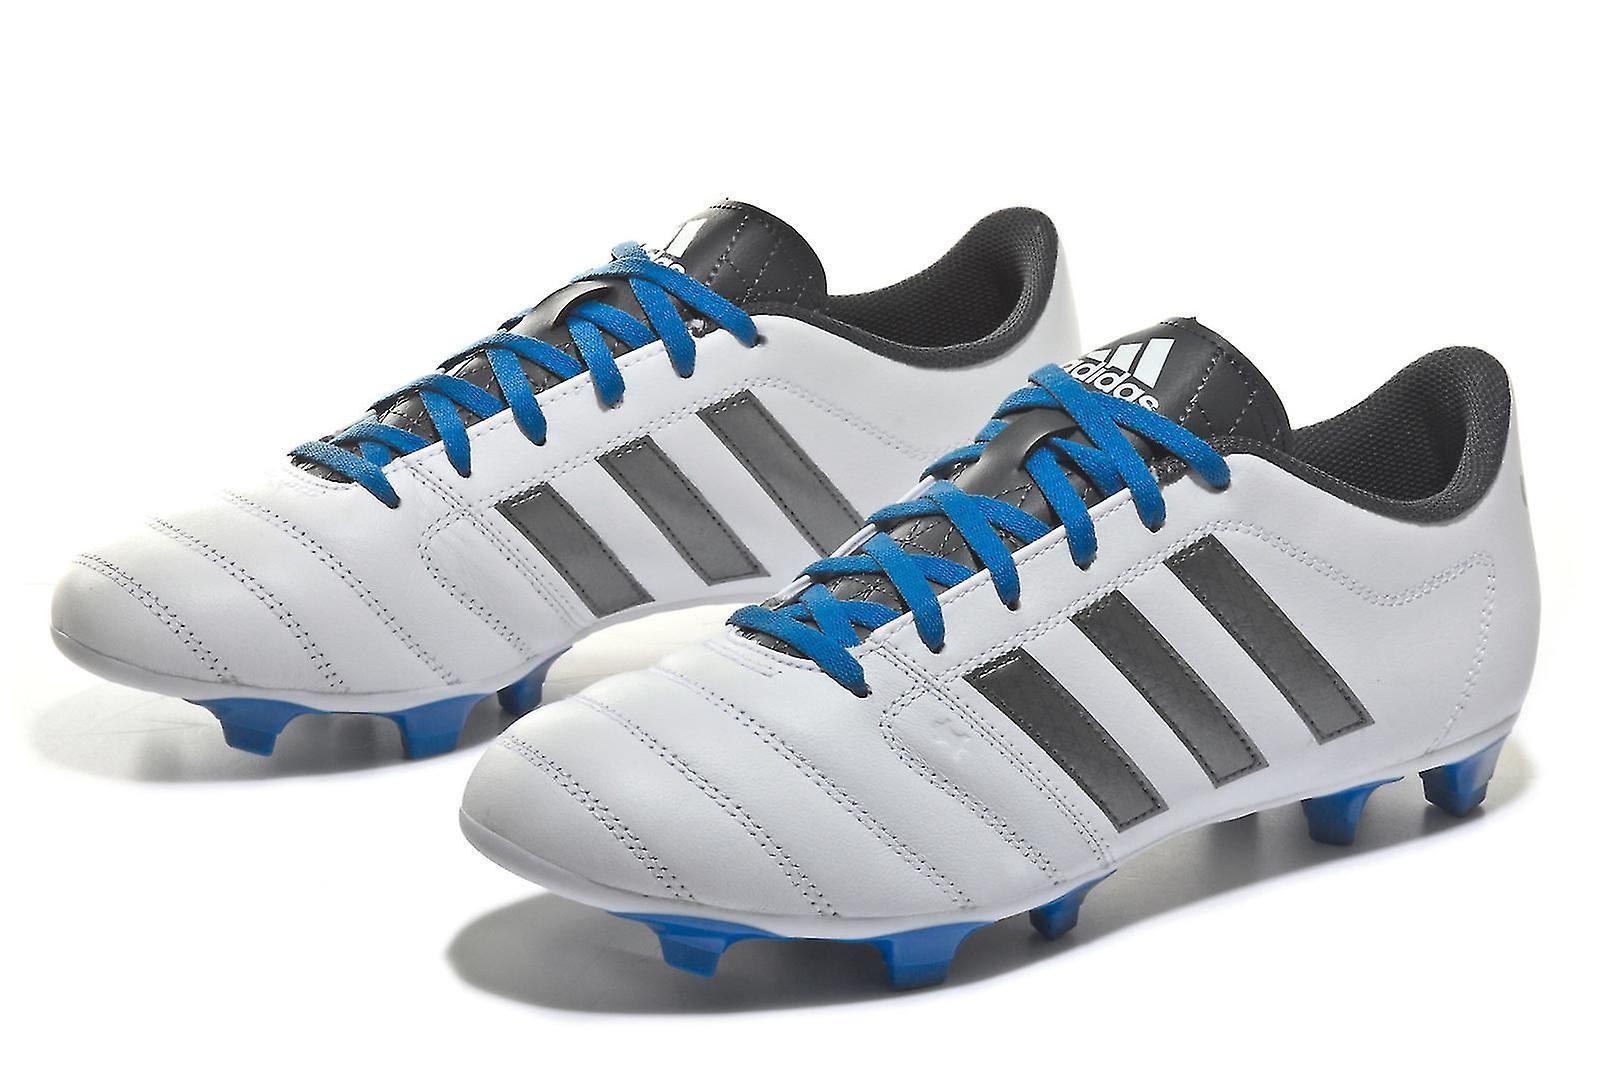 reasonably priced great deals the best attitude adidas Gloro 16.2 Fg Junior Football Boots White UK3.5/EU36